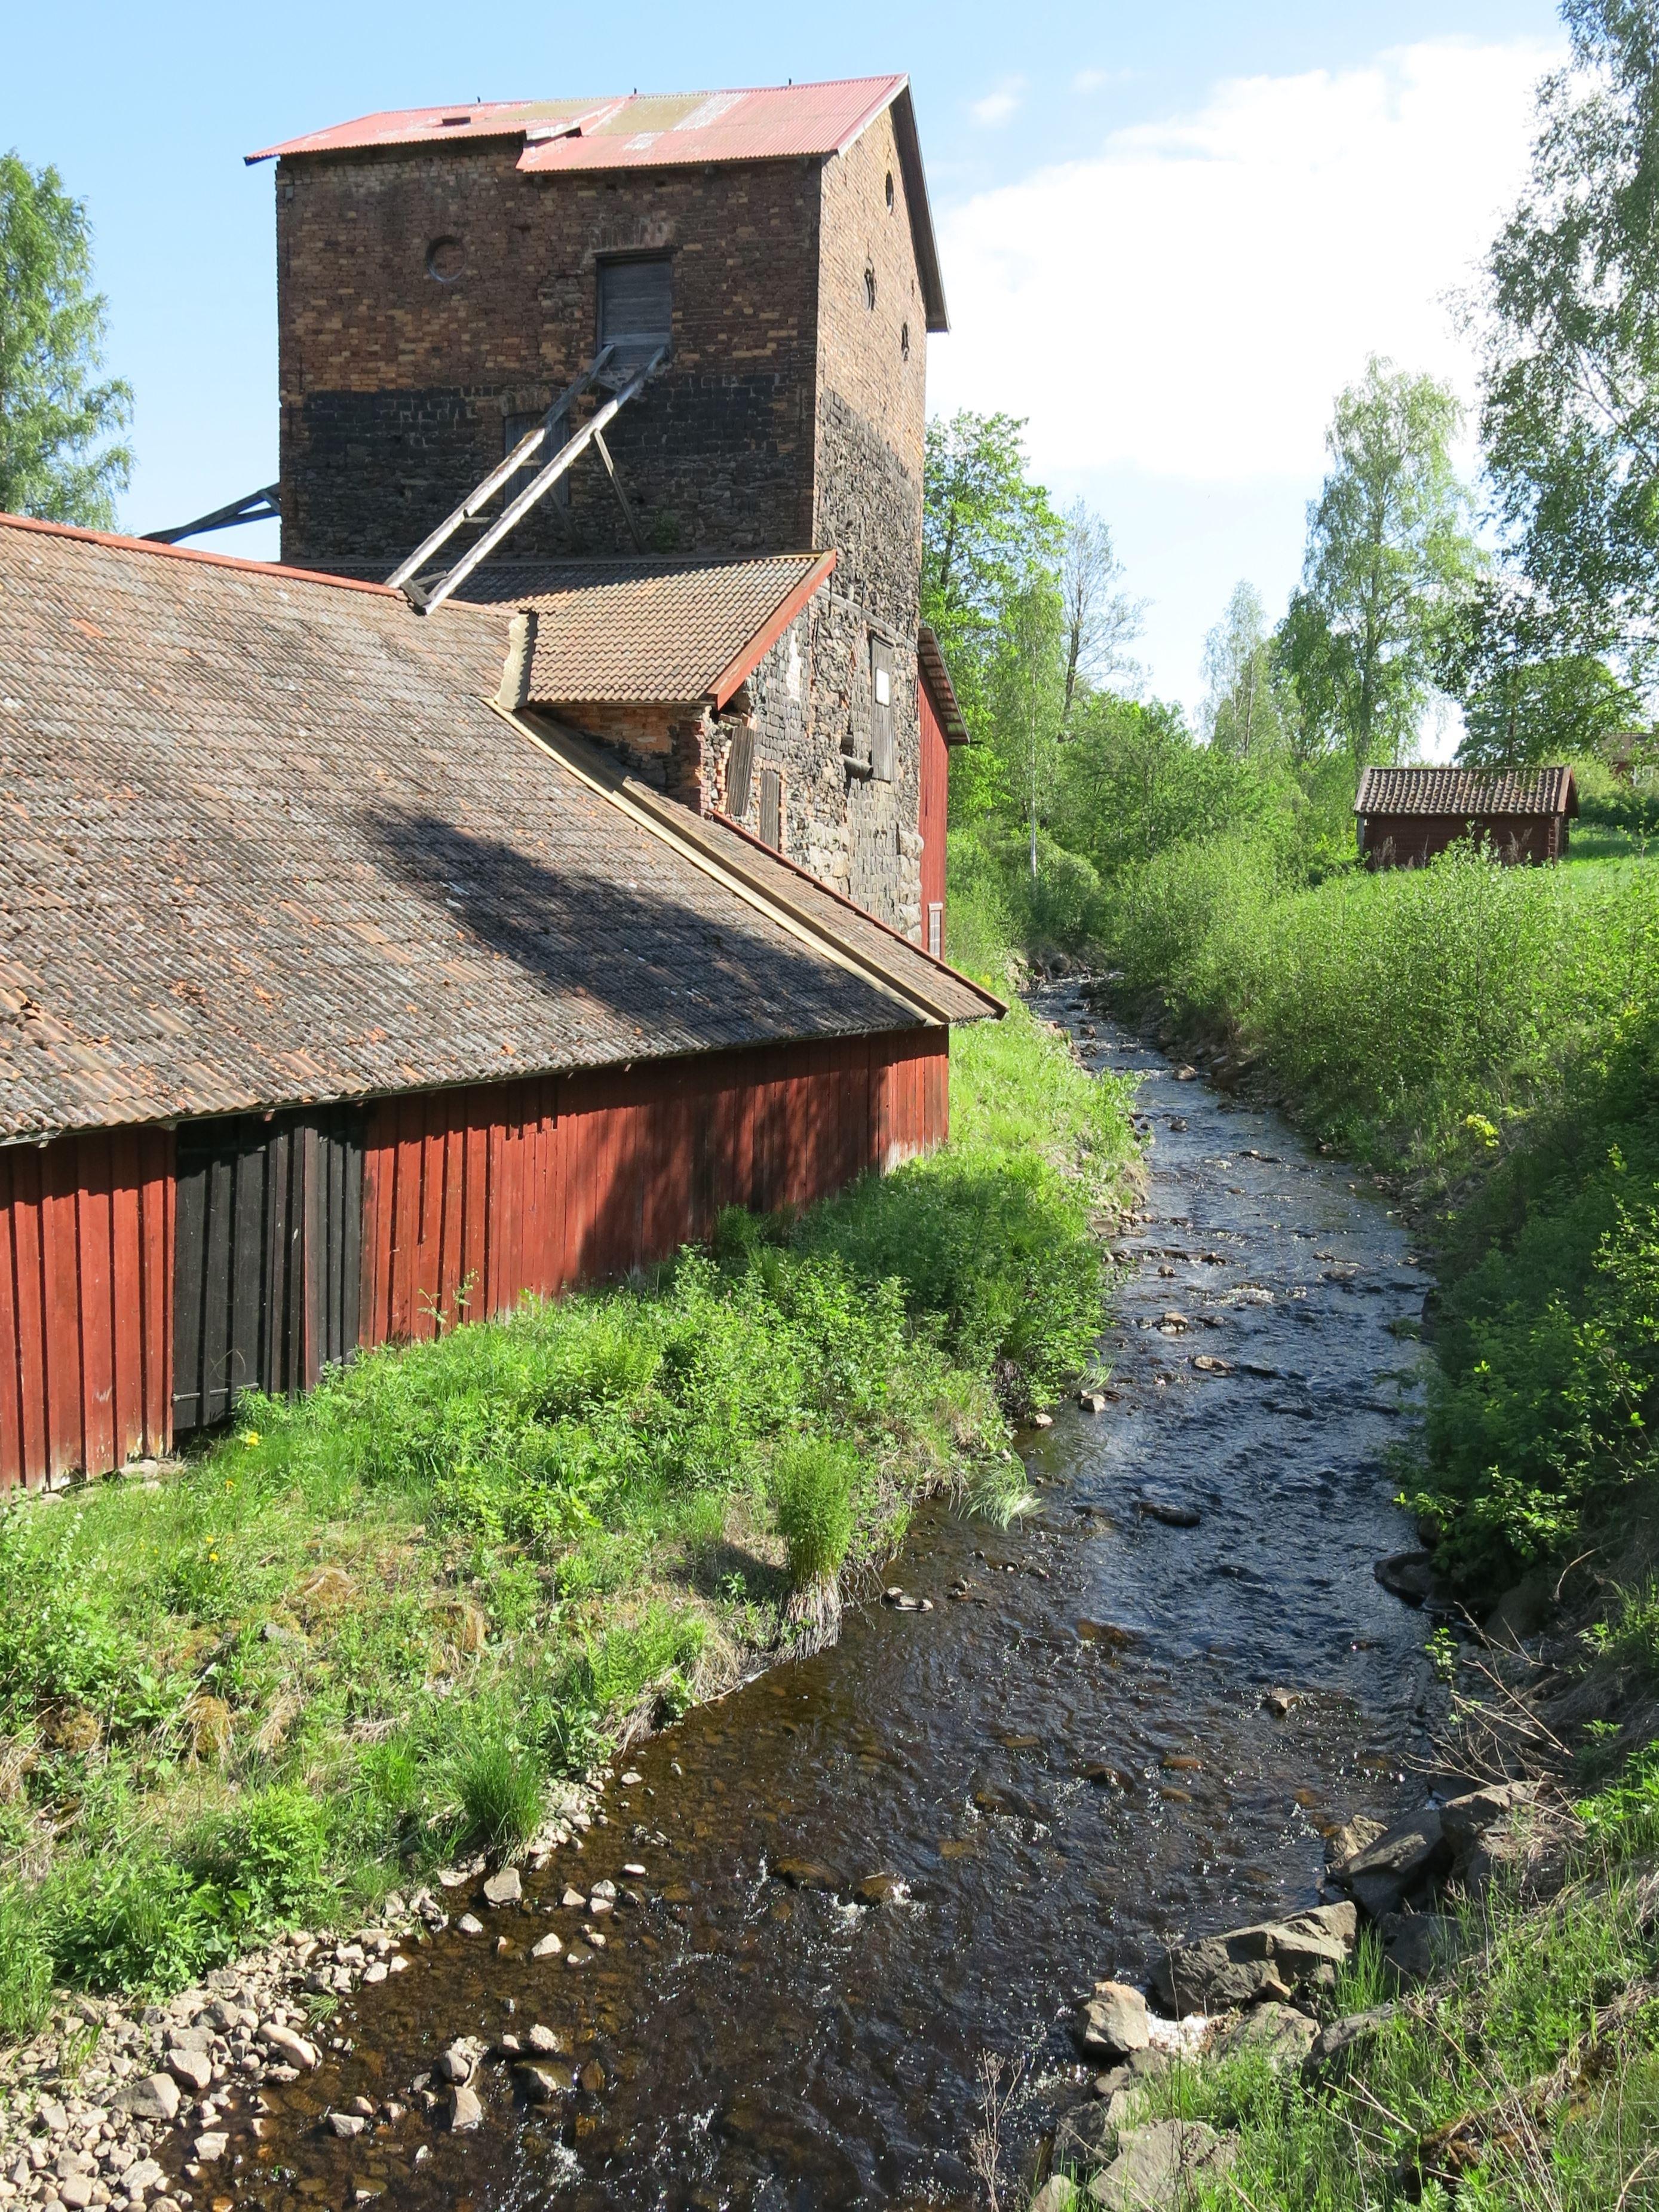 © Anna Falkengren, Ekomuseum., Flatenbergs hytta